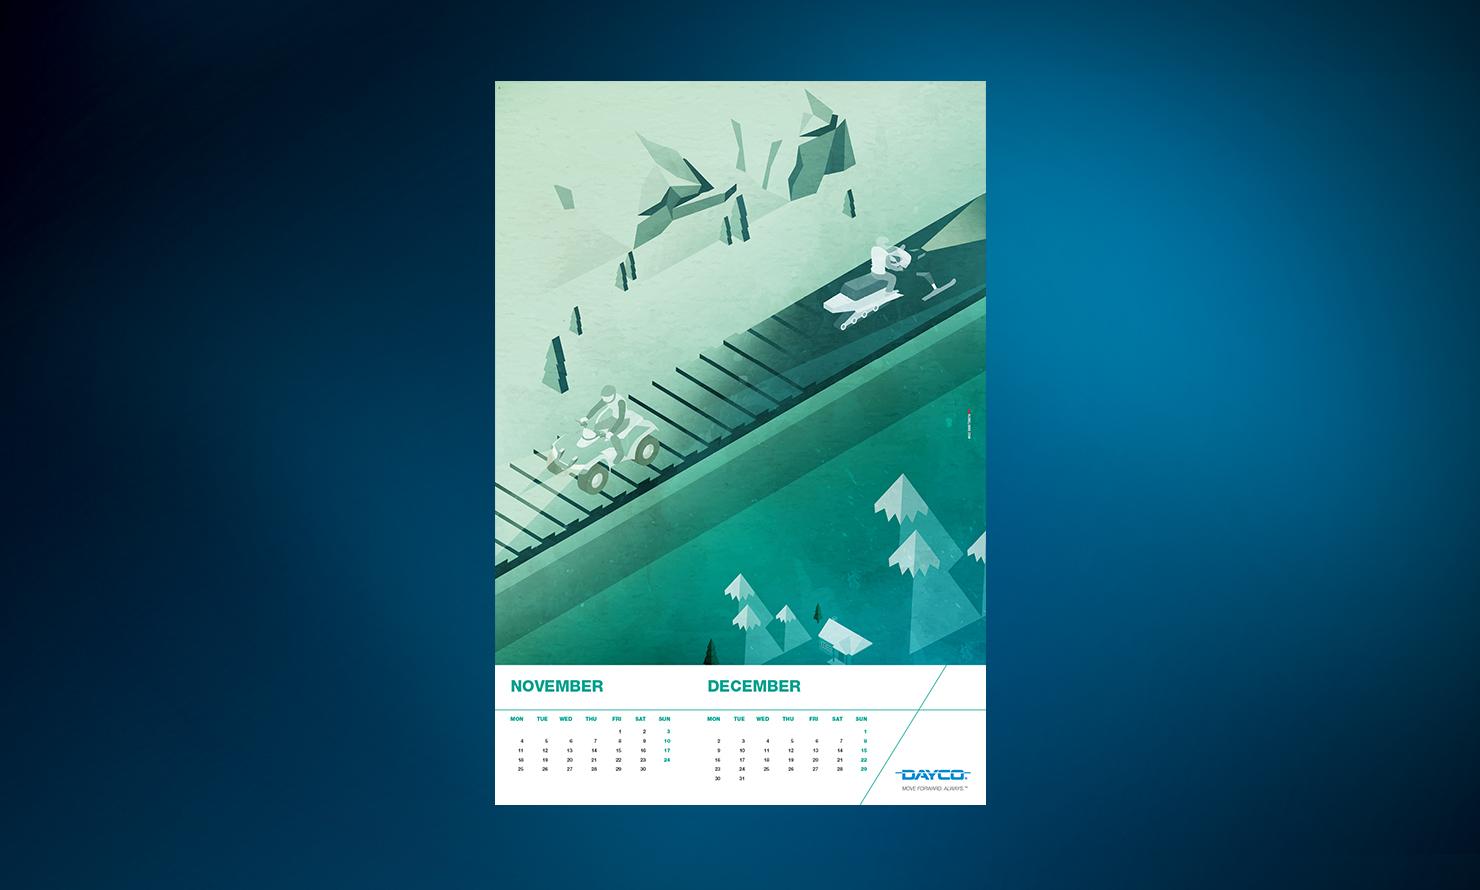 https://www.kubelibre.com/uploads/Slider-work-tutti-clienti/dayco-calendario-2019-6.jpg